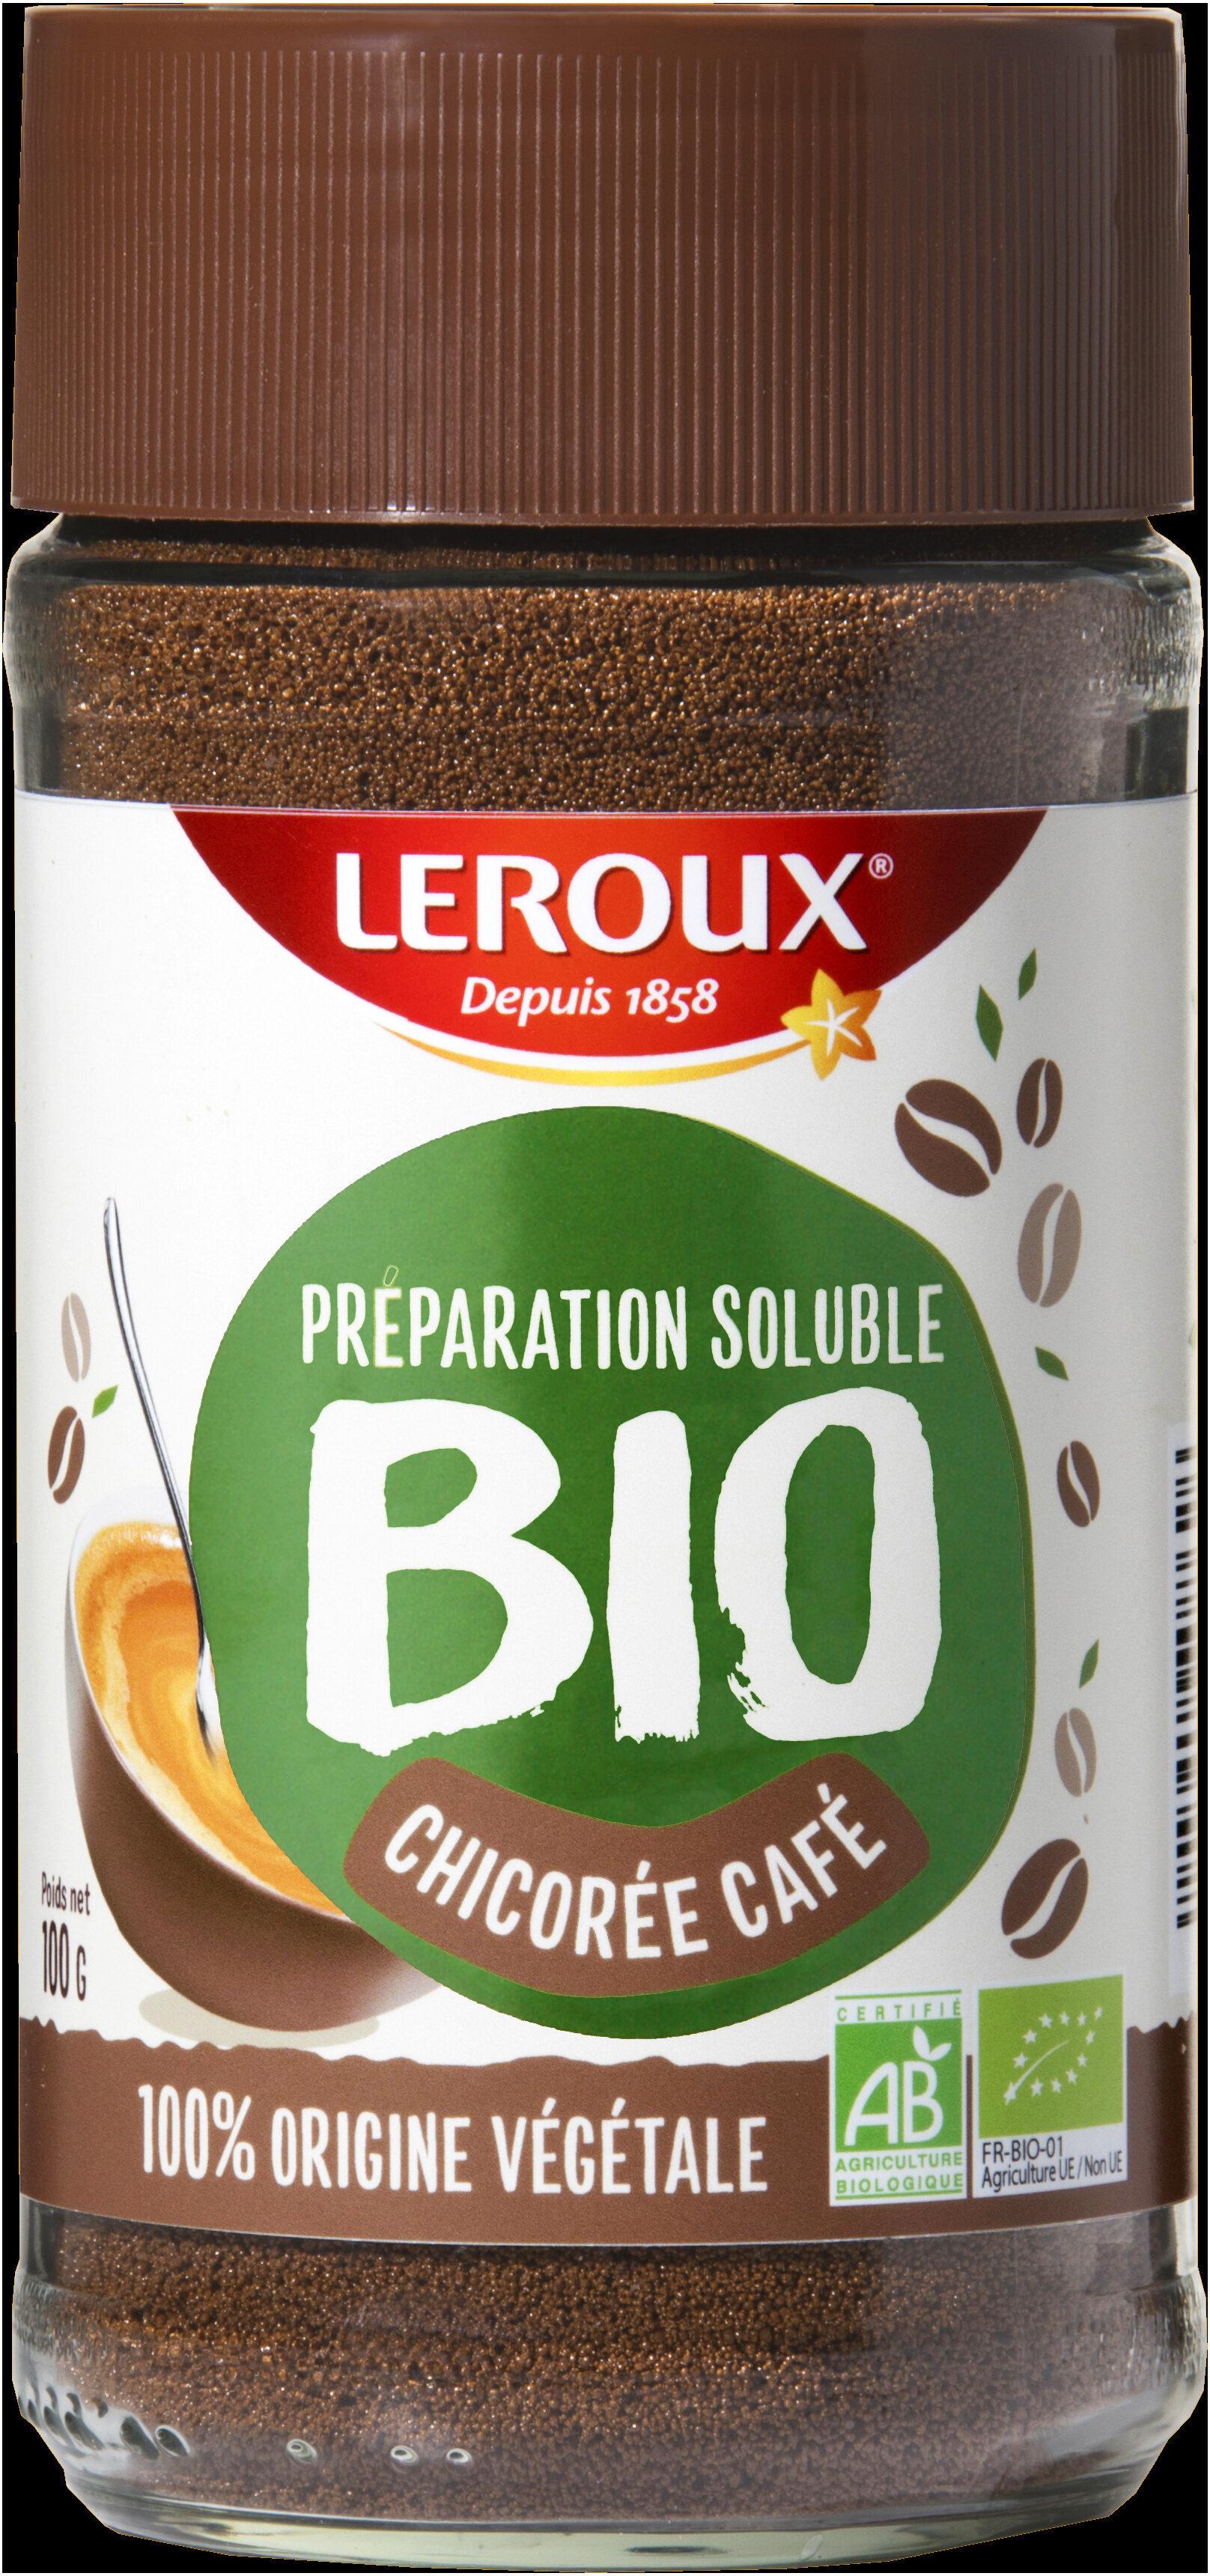 Préparation soluble Chicorée Café Bio - Prodotto - fr